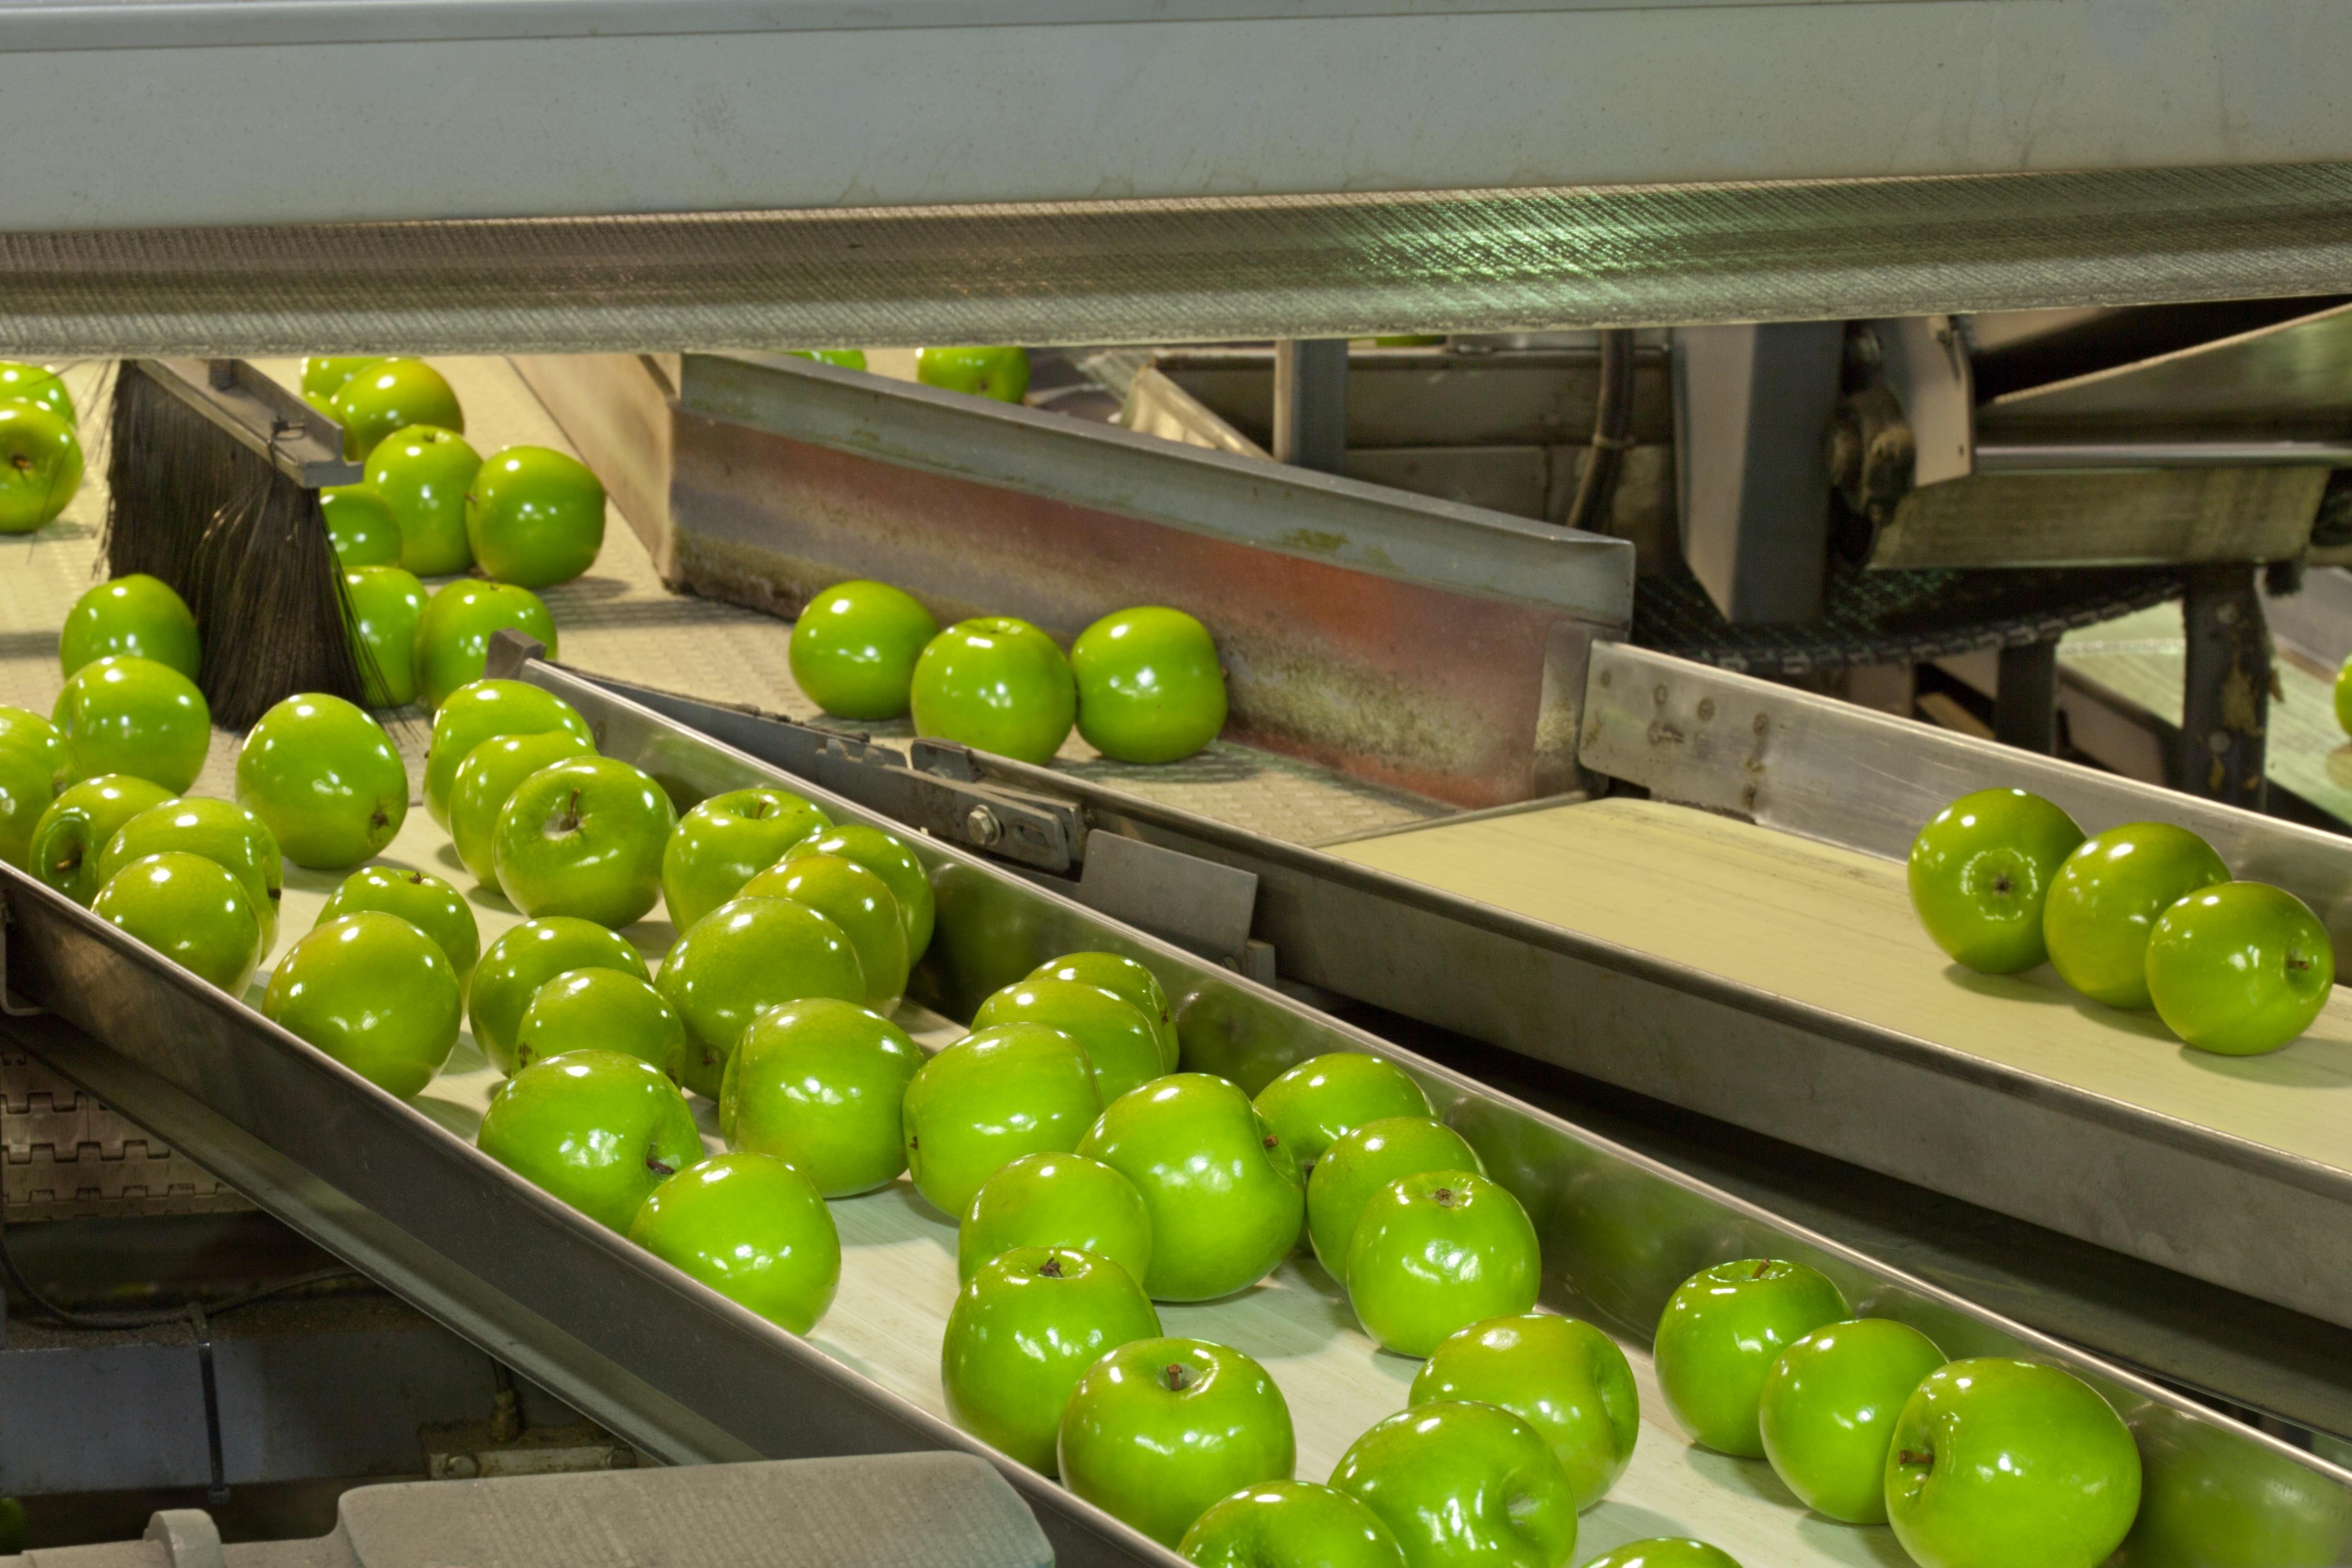 Apples being sorted on food grade conveyor belts